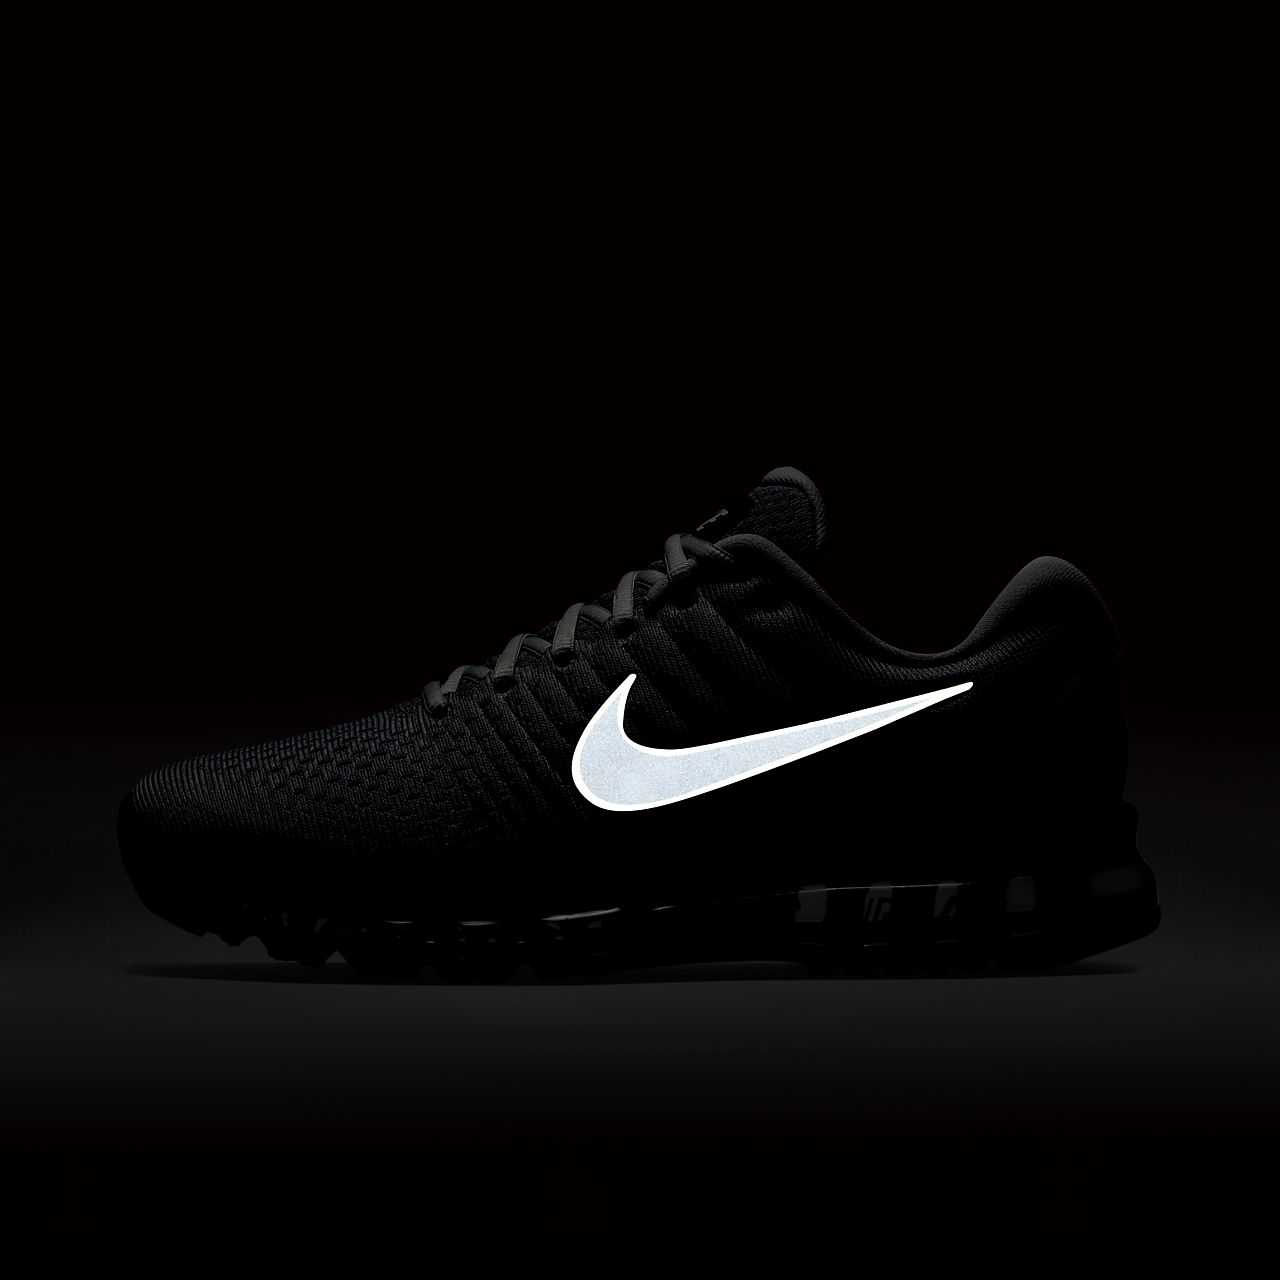 Chaussure Nike Air Max Homme 2015 general